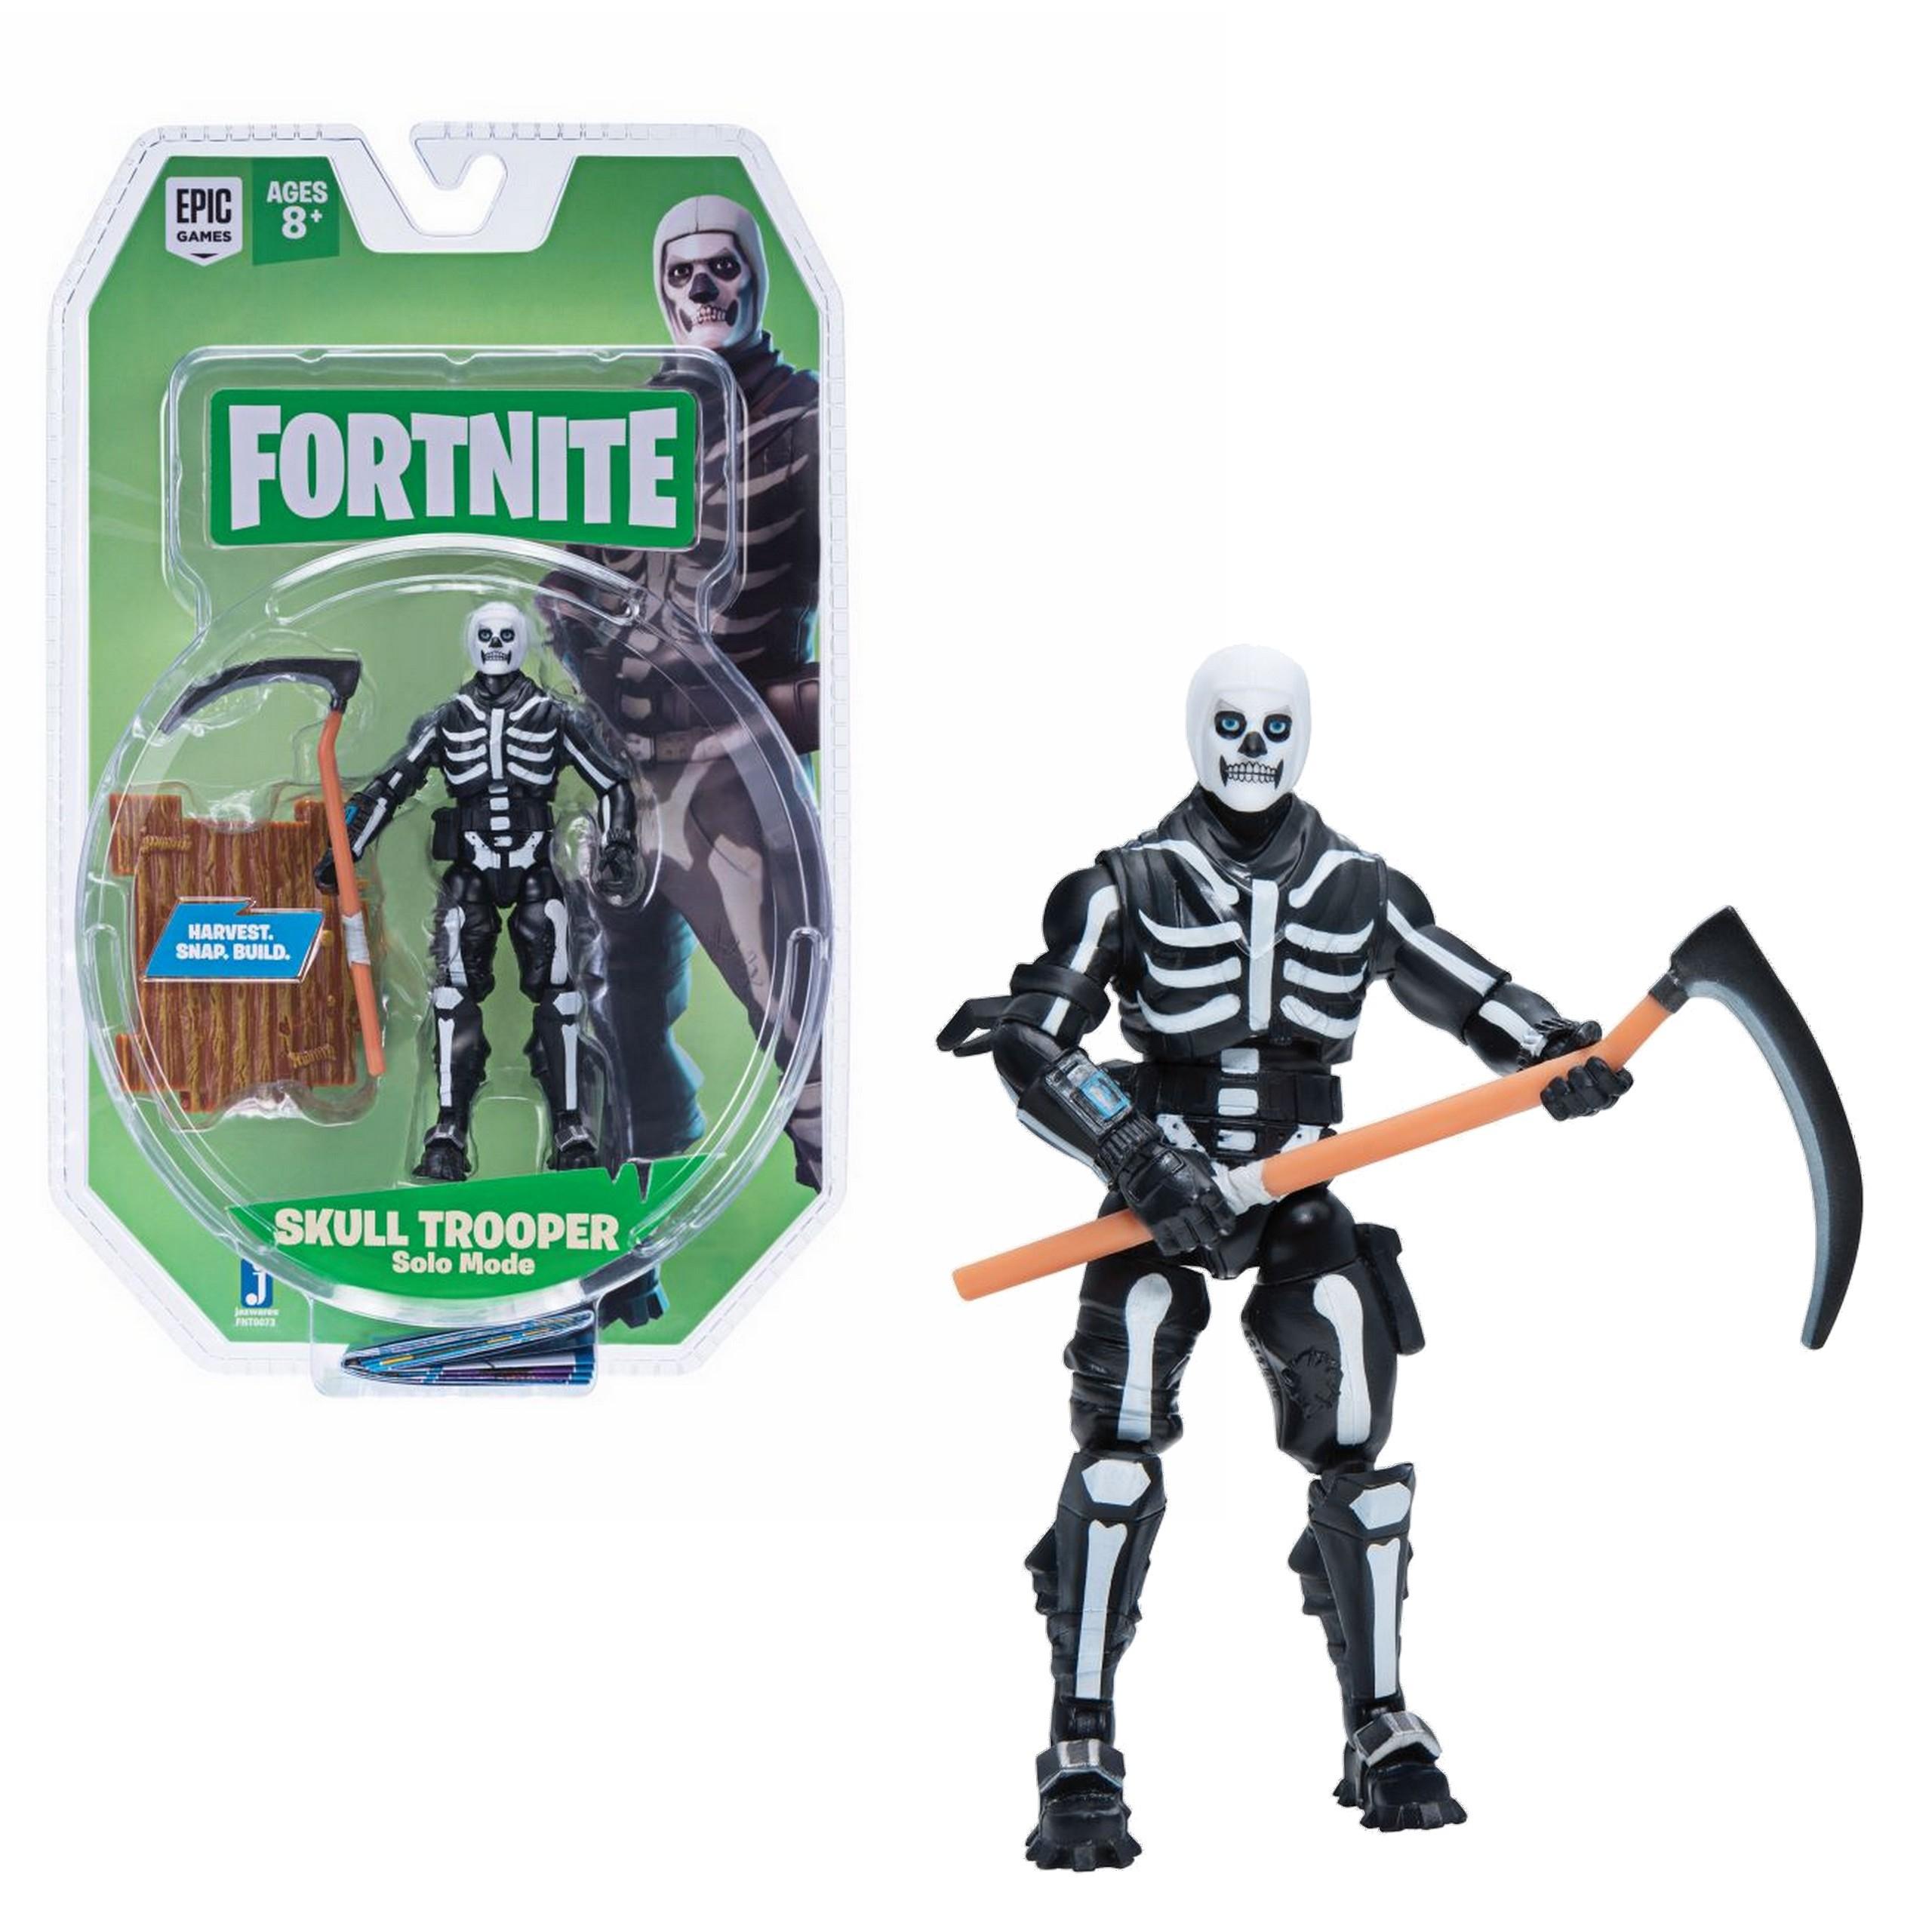 JAZWARES FORTNITE Solo Mode 1 hahmo - Skull Trooper 10 cm